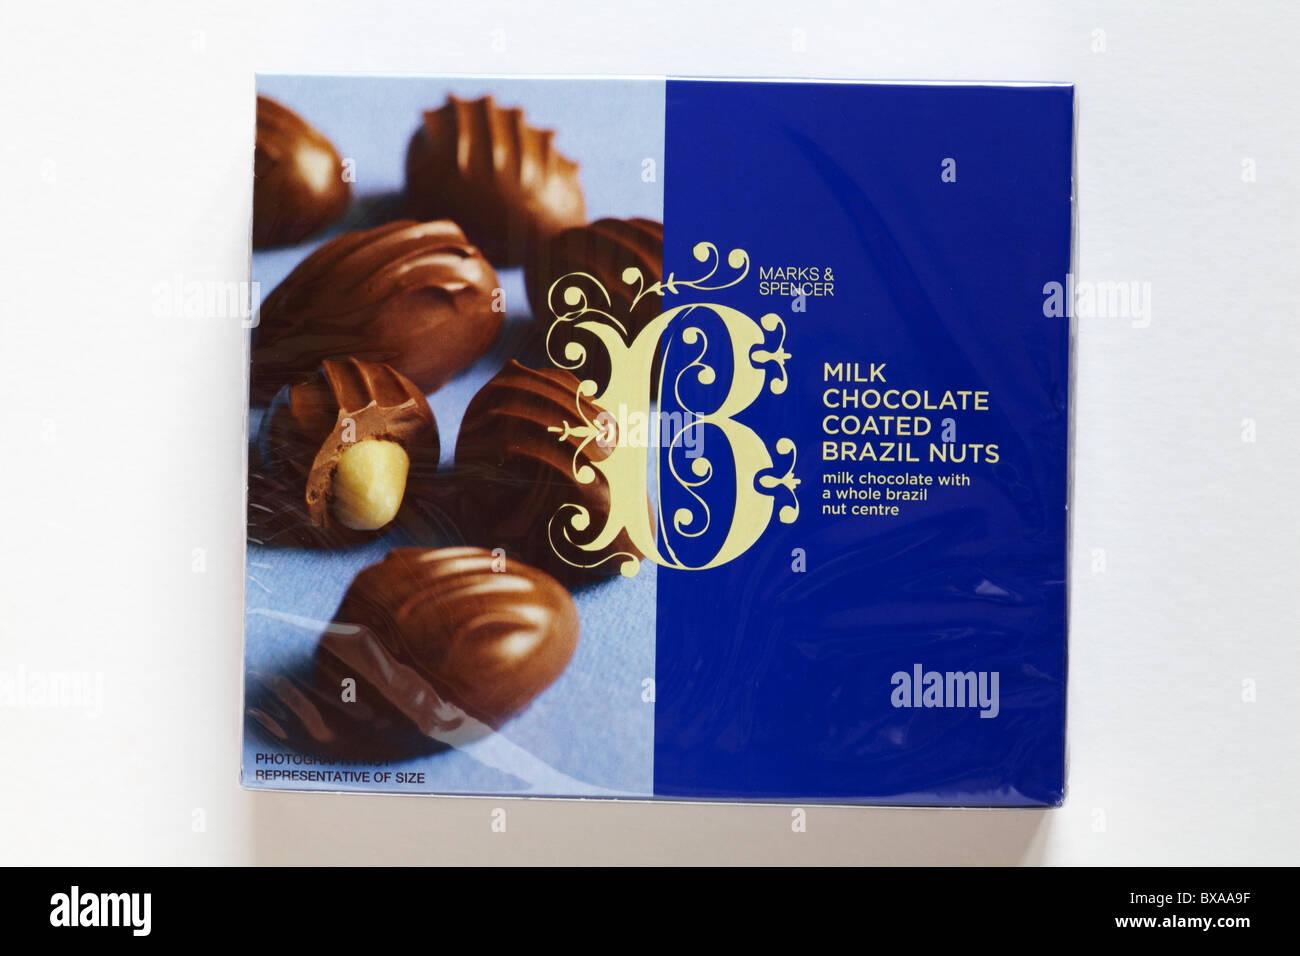 Milk Chocolate Coated Brazil Nuts